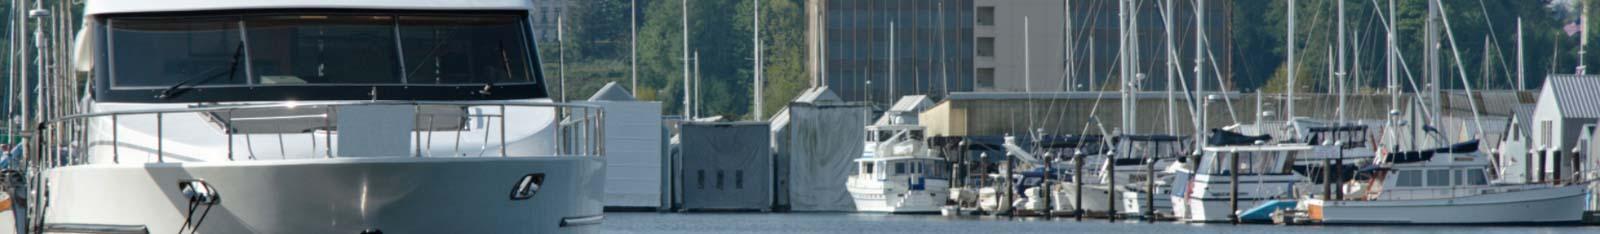 Olympia Waterfront Market Statistics